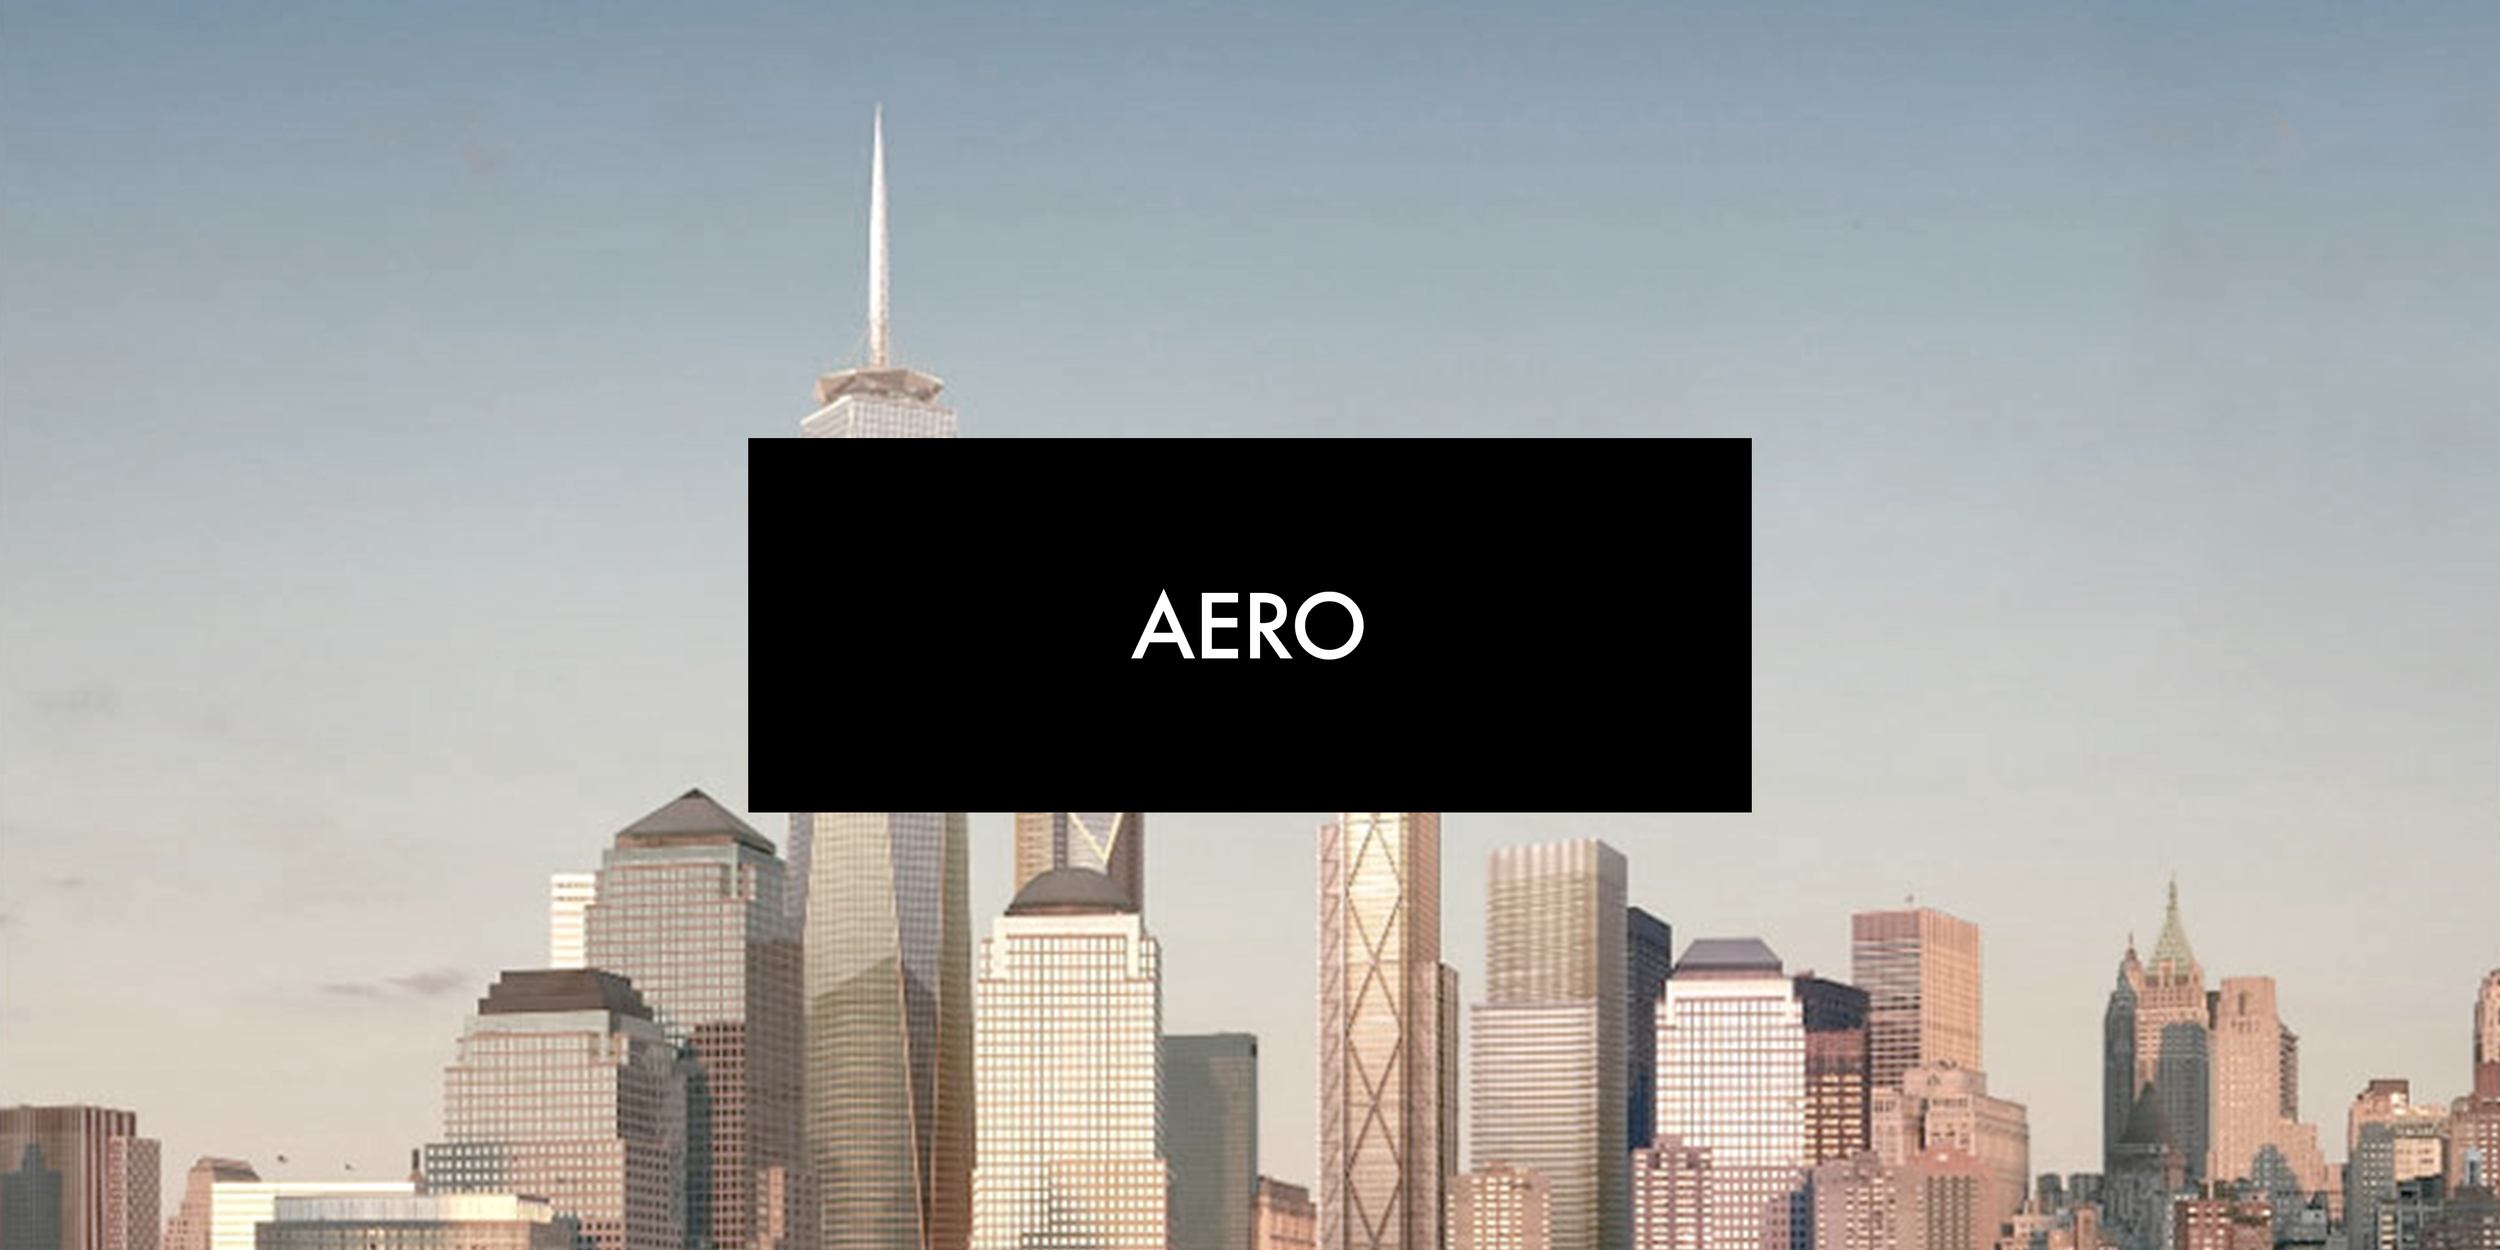 AERO_Horizontal.jpg